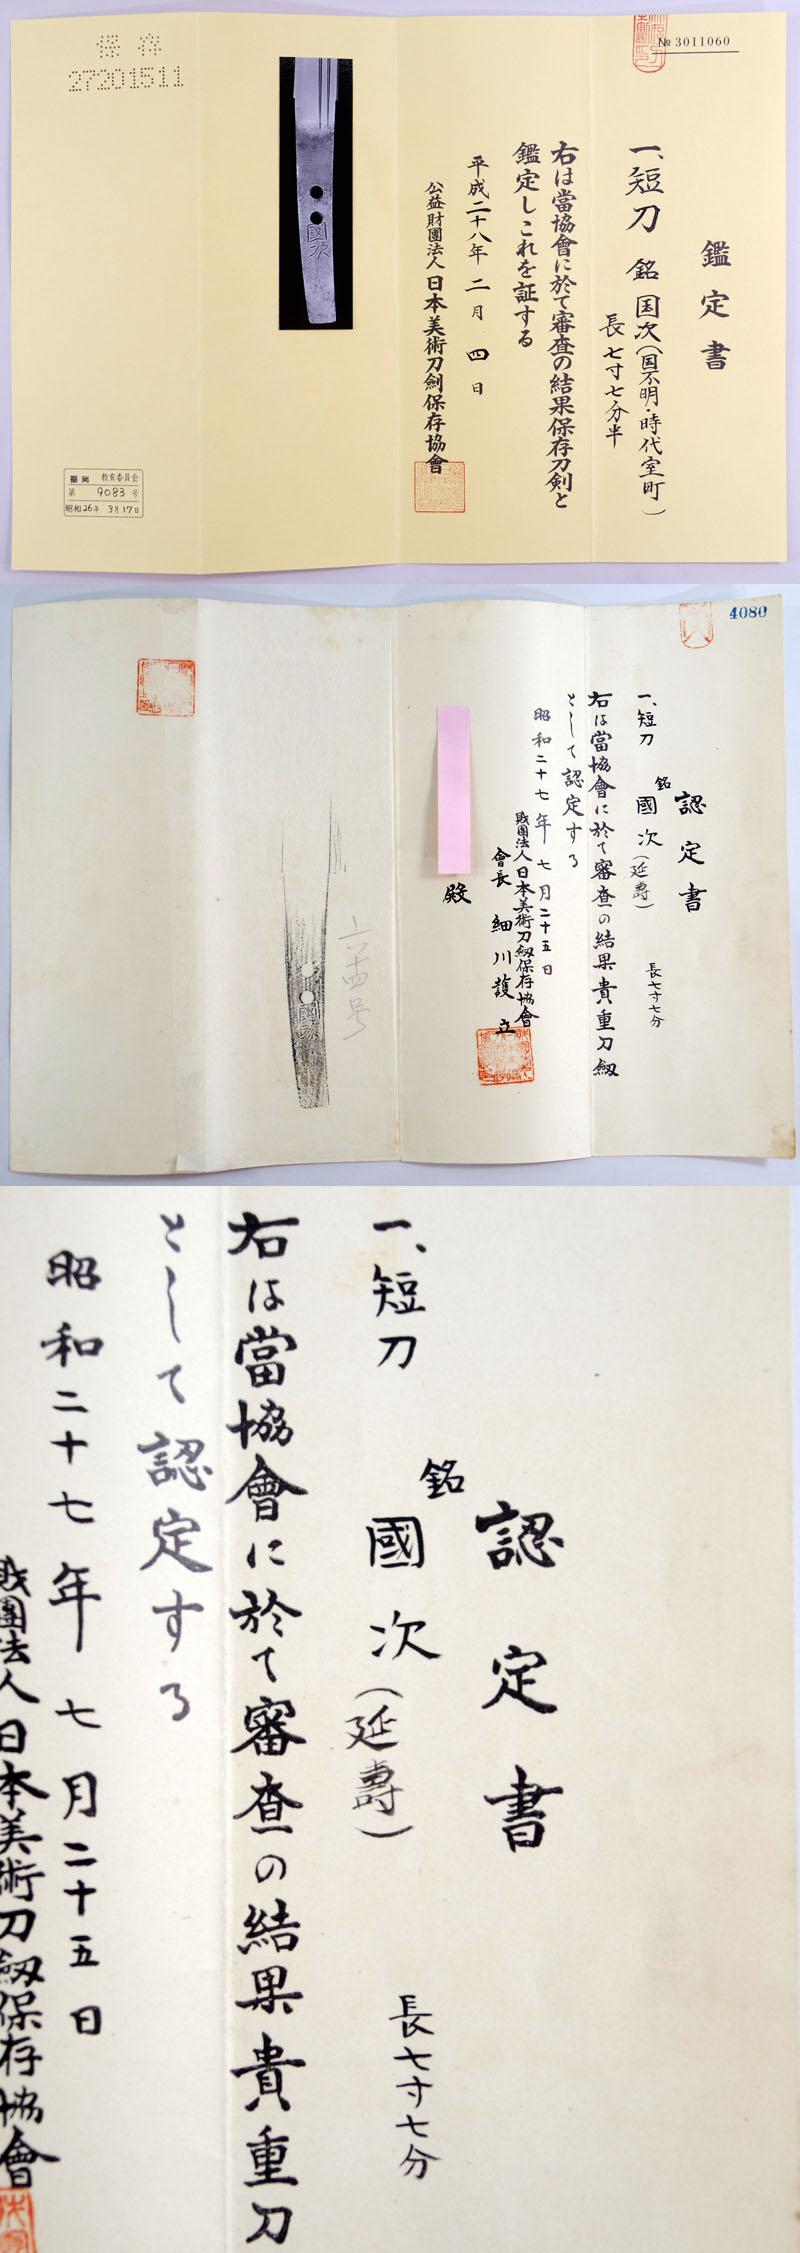 国次(国不明・時代室町) Picture of Certificate